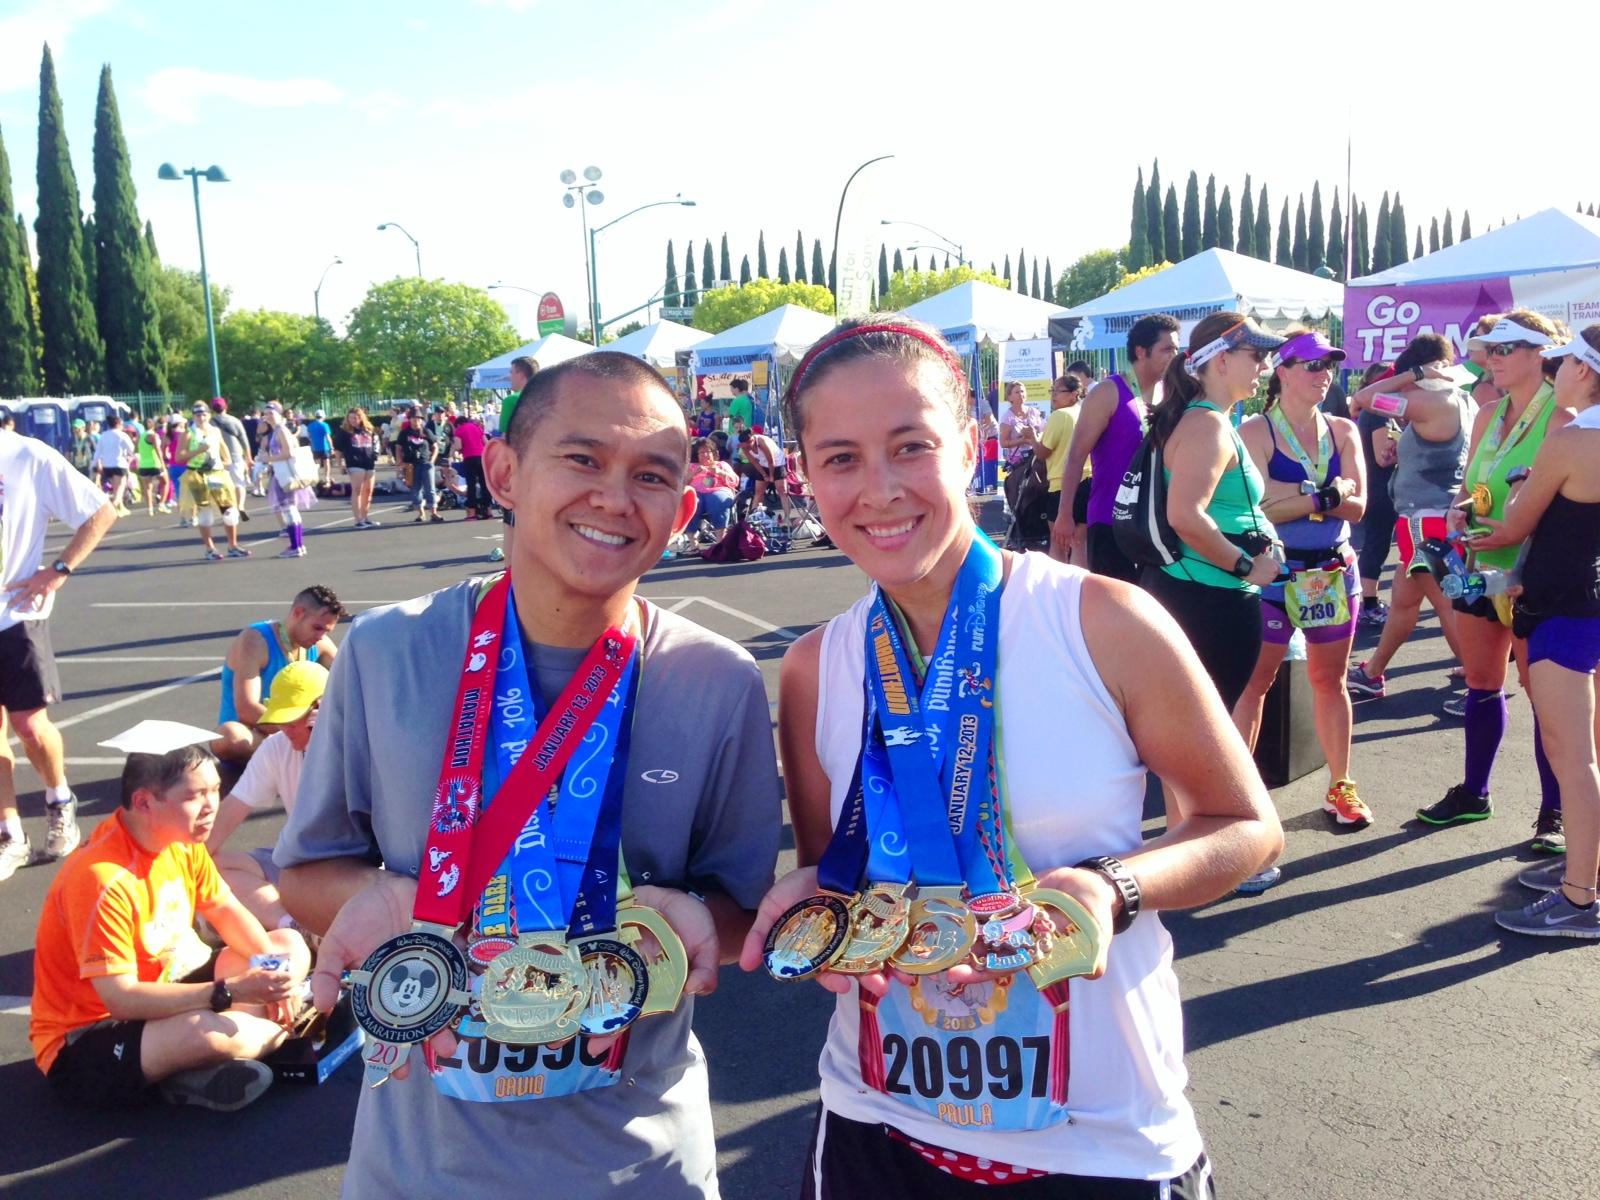 5 medals each: WDW Marathon Weekend, Dumbo Double Dare, Disneyland 10k, Disneyland Half and Coast to Coast.